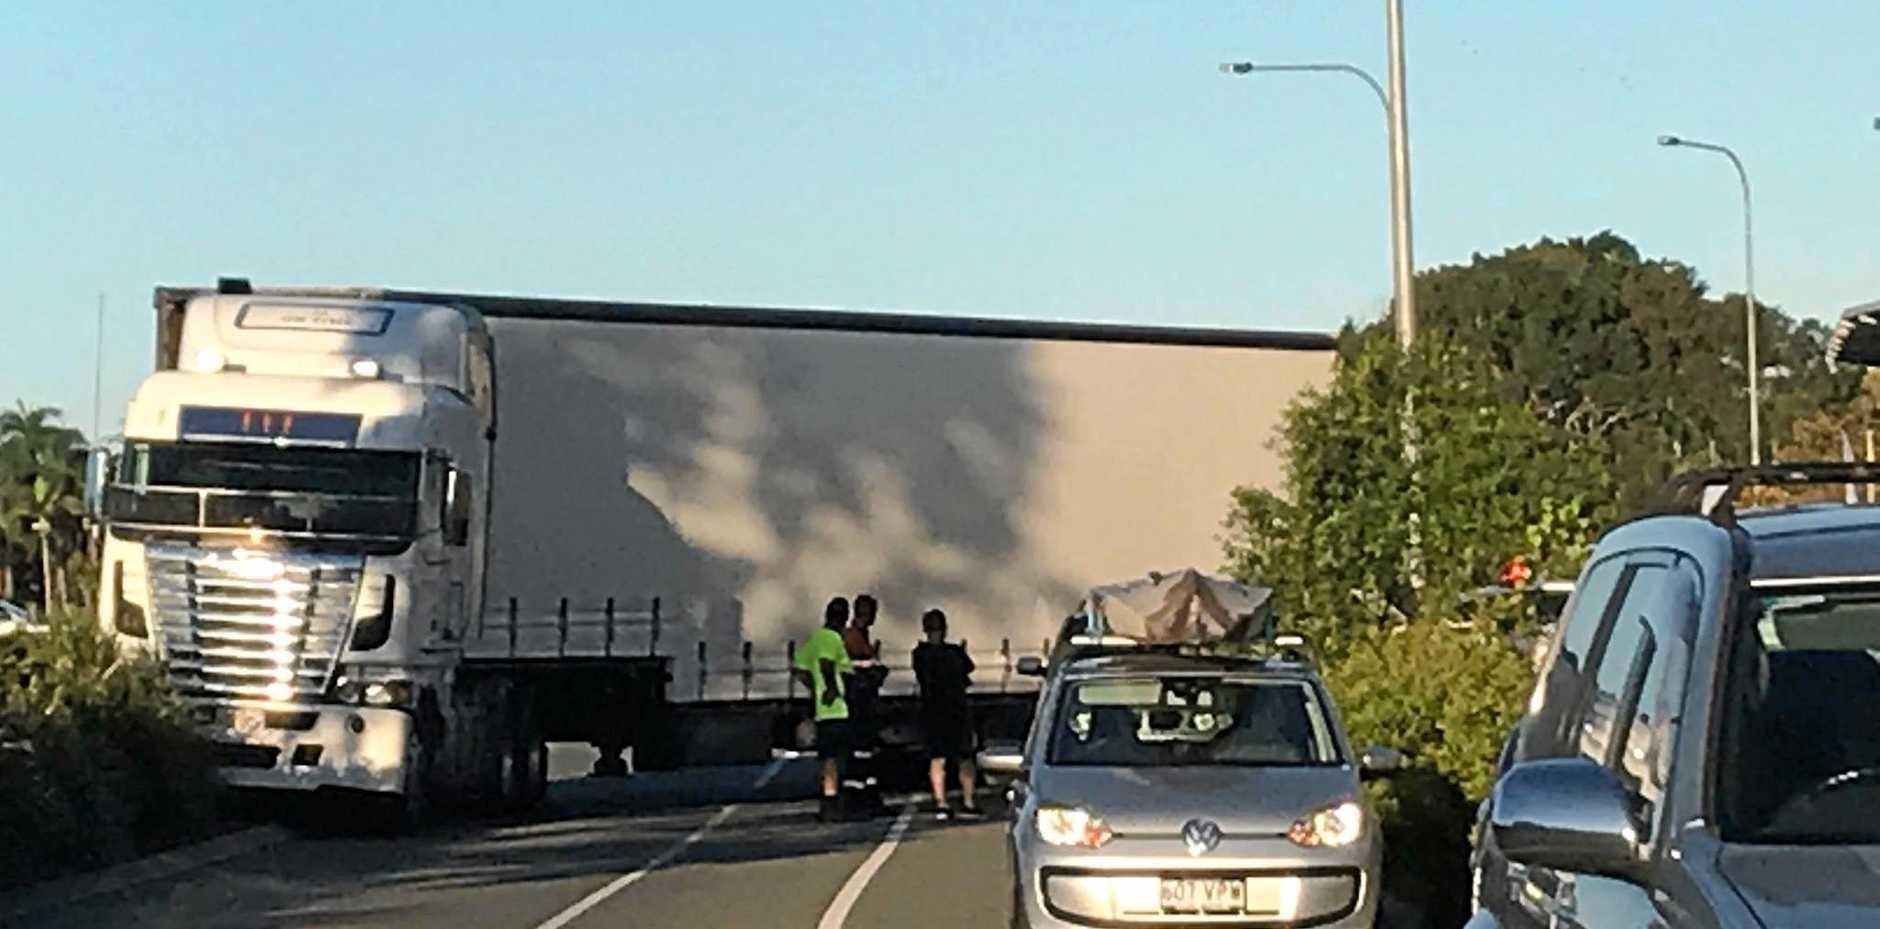 WATCH: Truck's epic Bunnings fail causes mega traffic jam